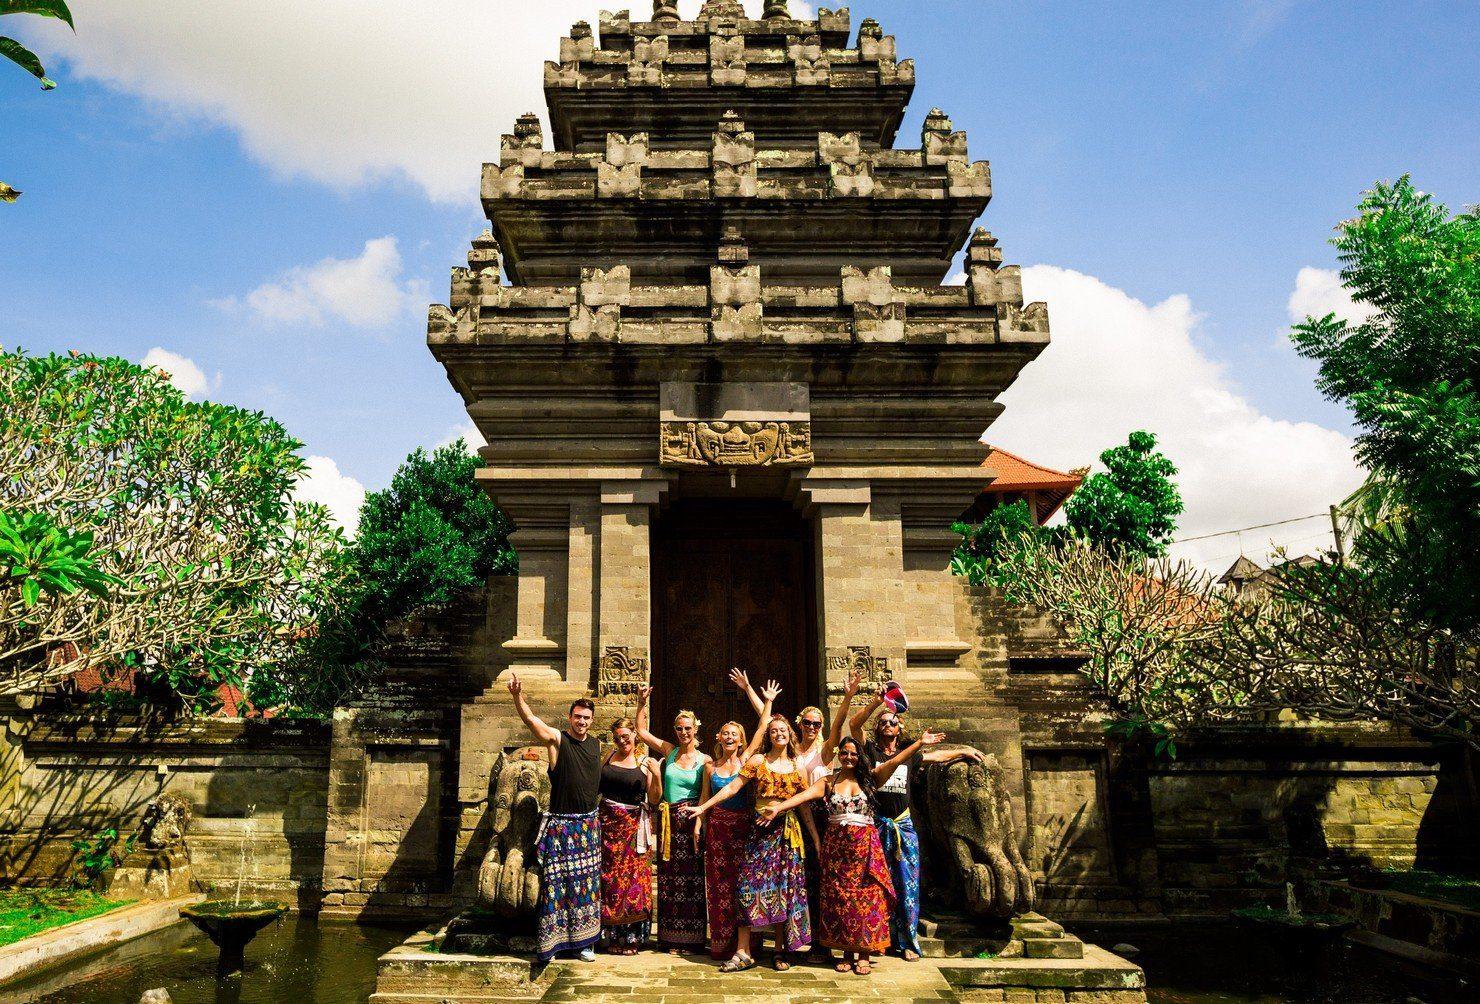 Фото храма Пусеринг Джагад